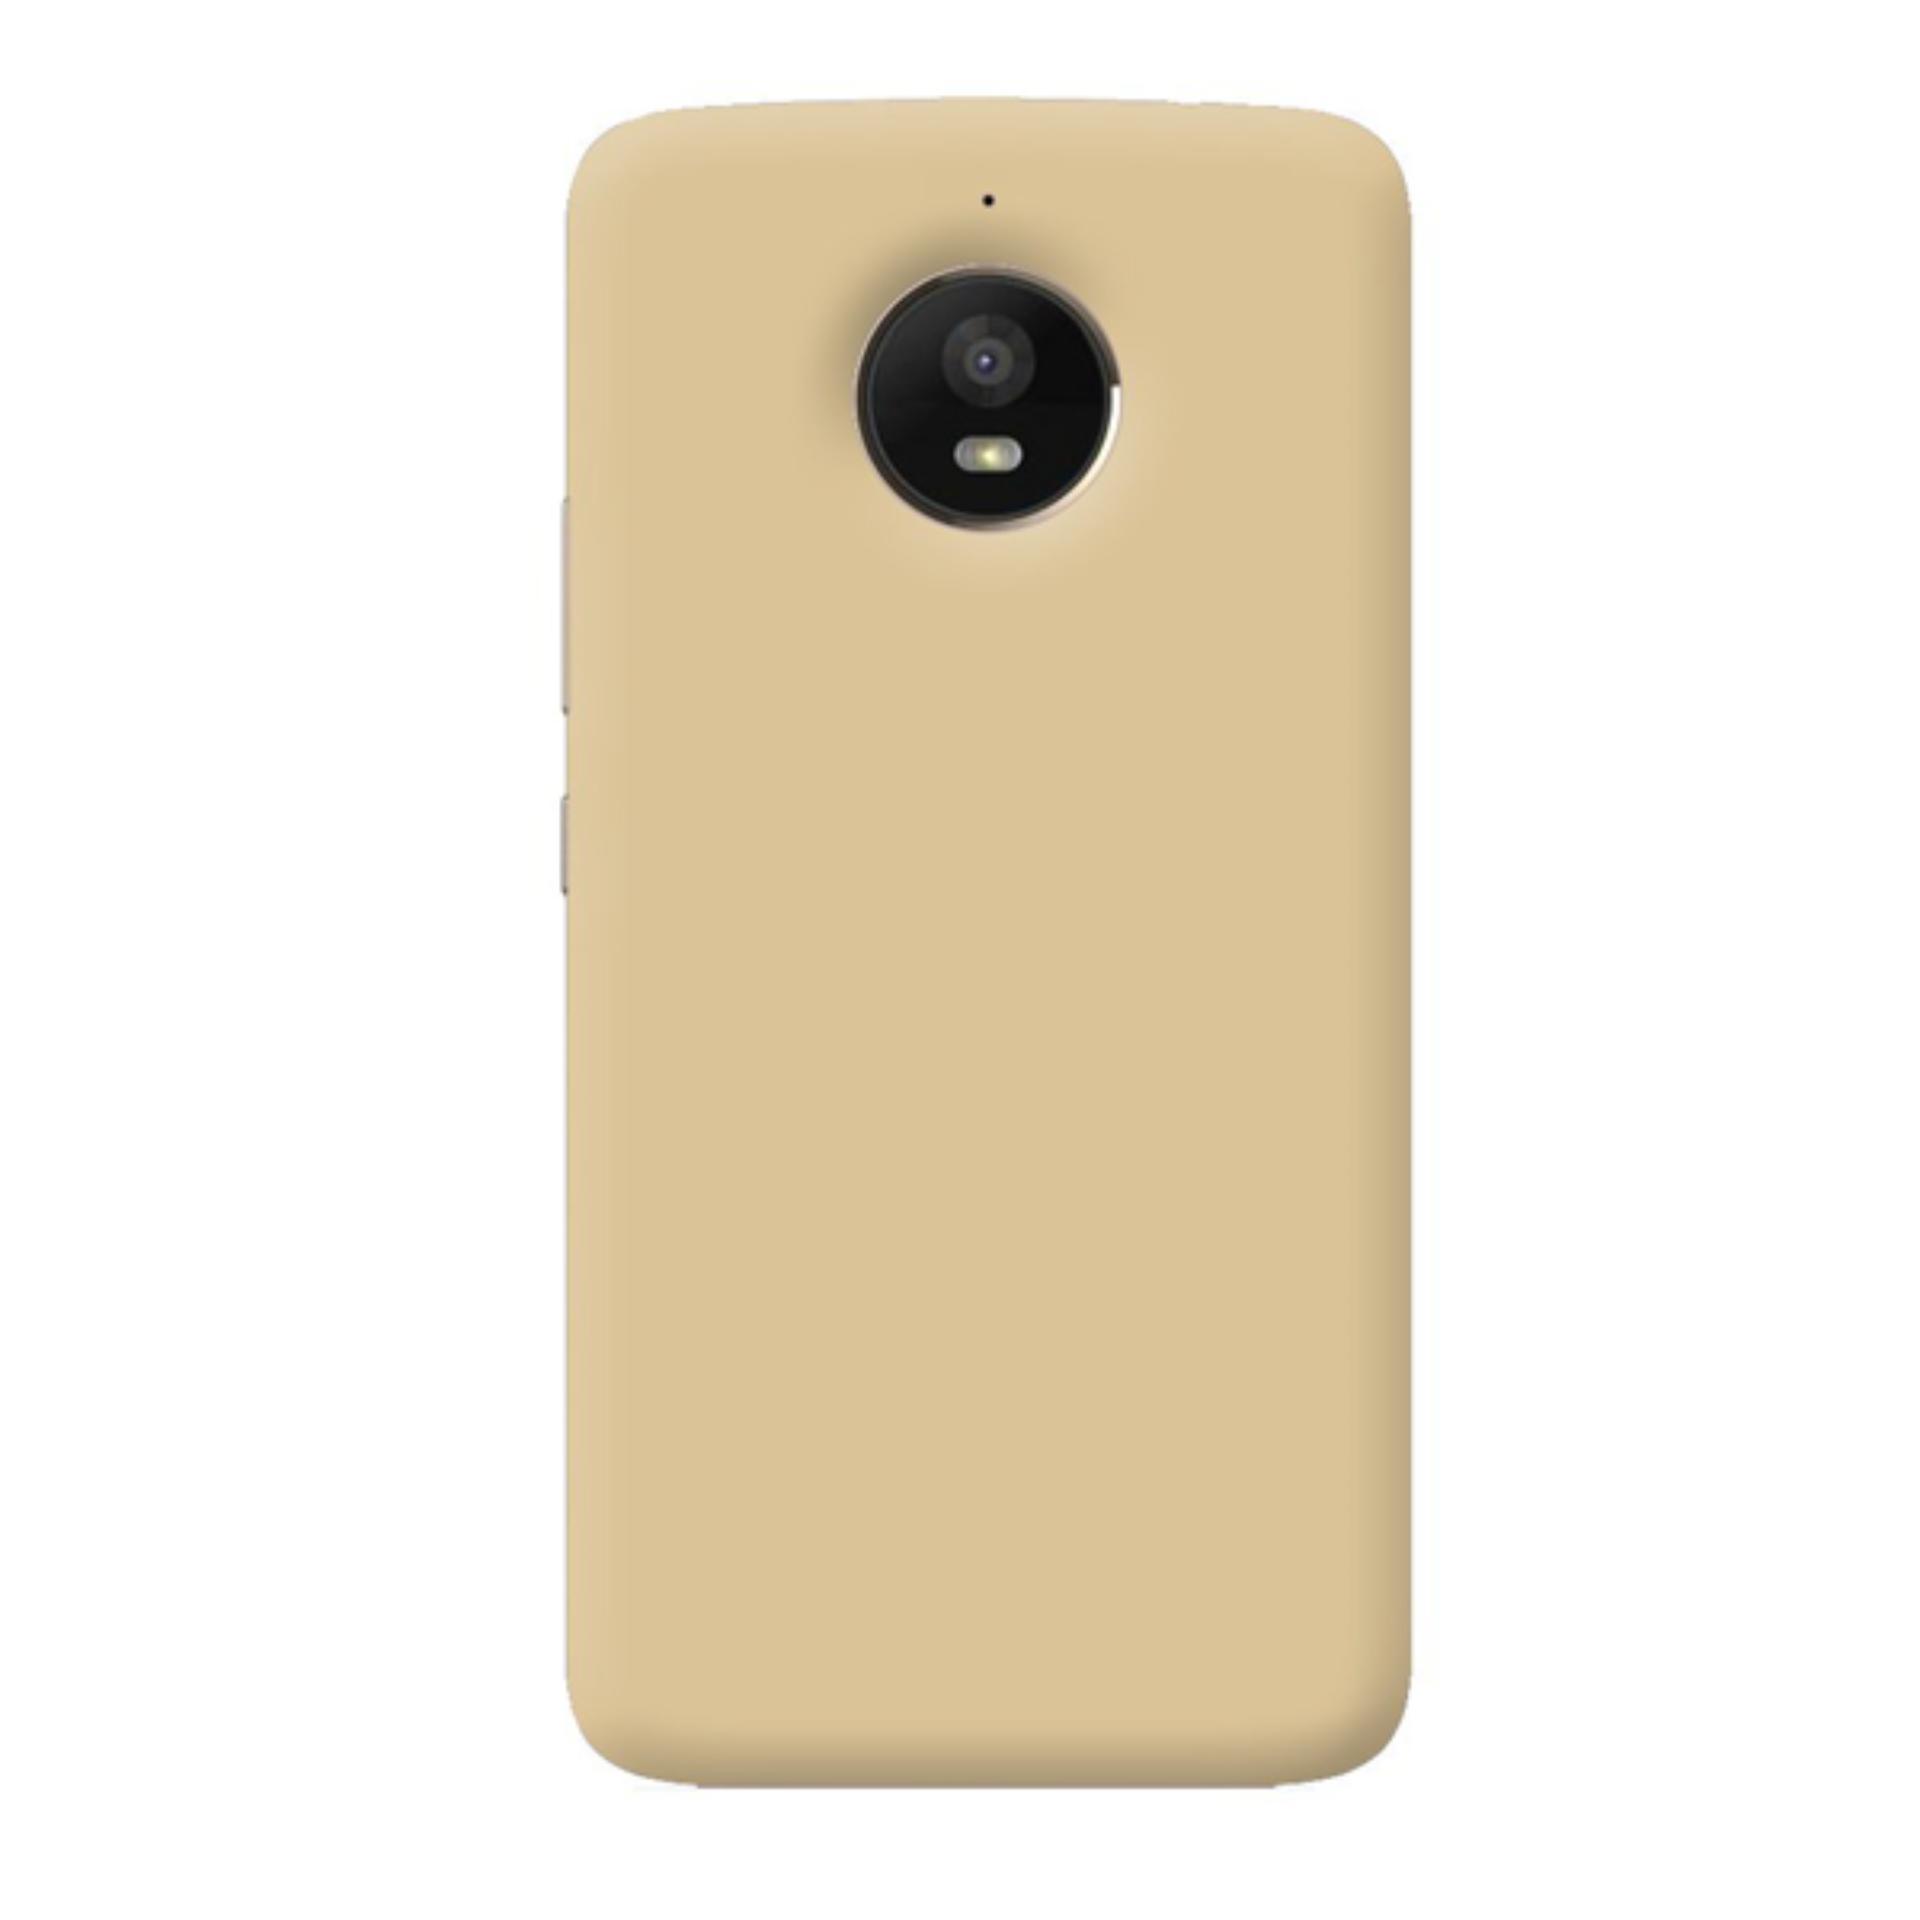 Case dyval Hardcase Motorola E4 Plus gold